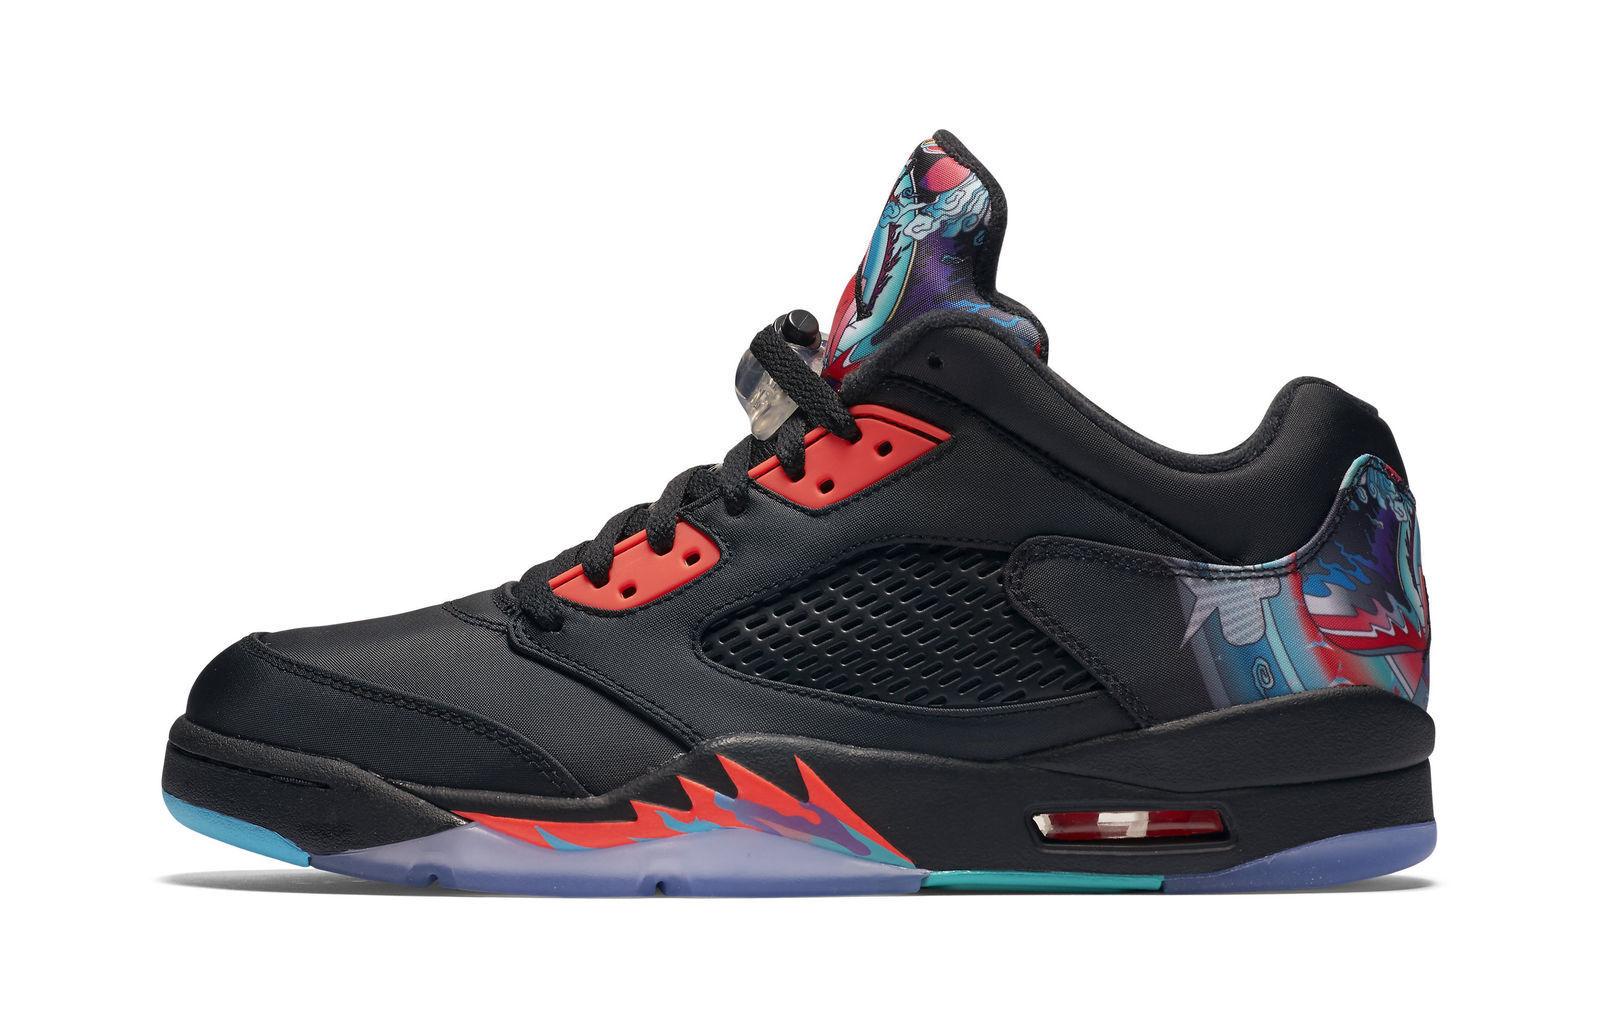 f445bb22756ae2 Nike Air Jordan 5 Retro Low Size 14 Chinese Year Black Crimson ...